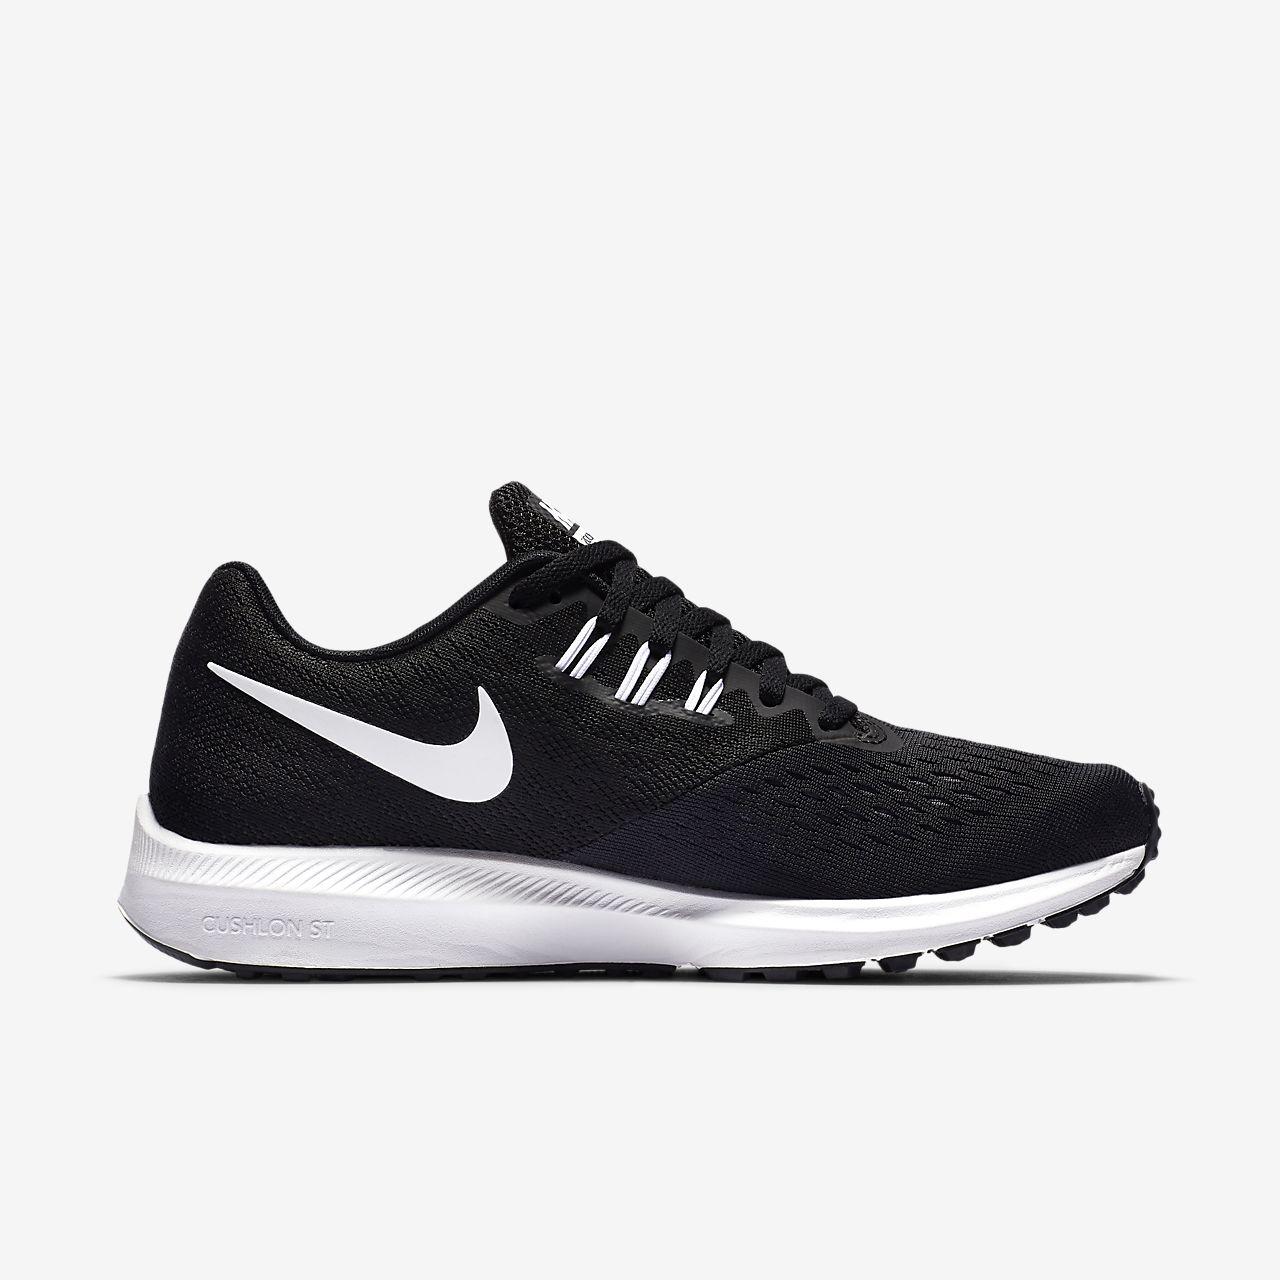 Hommes Zoom Winflo 4 Trail Chaussures De Course Nike lEEtl